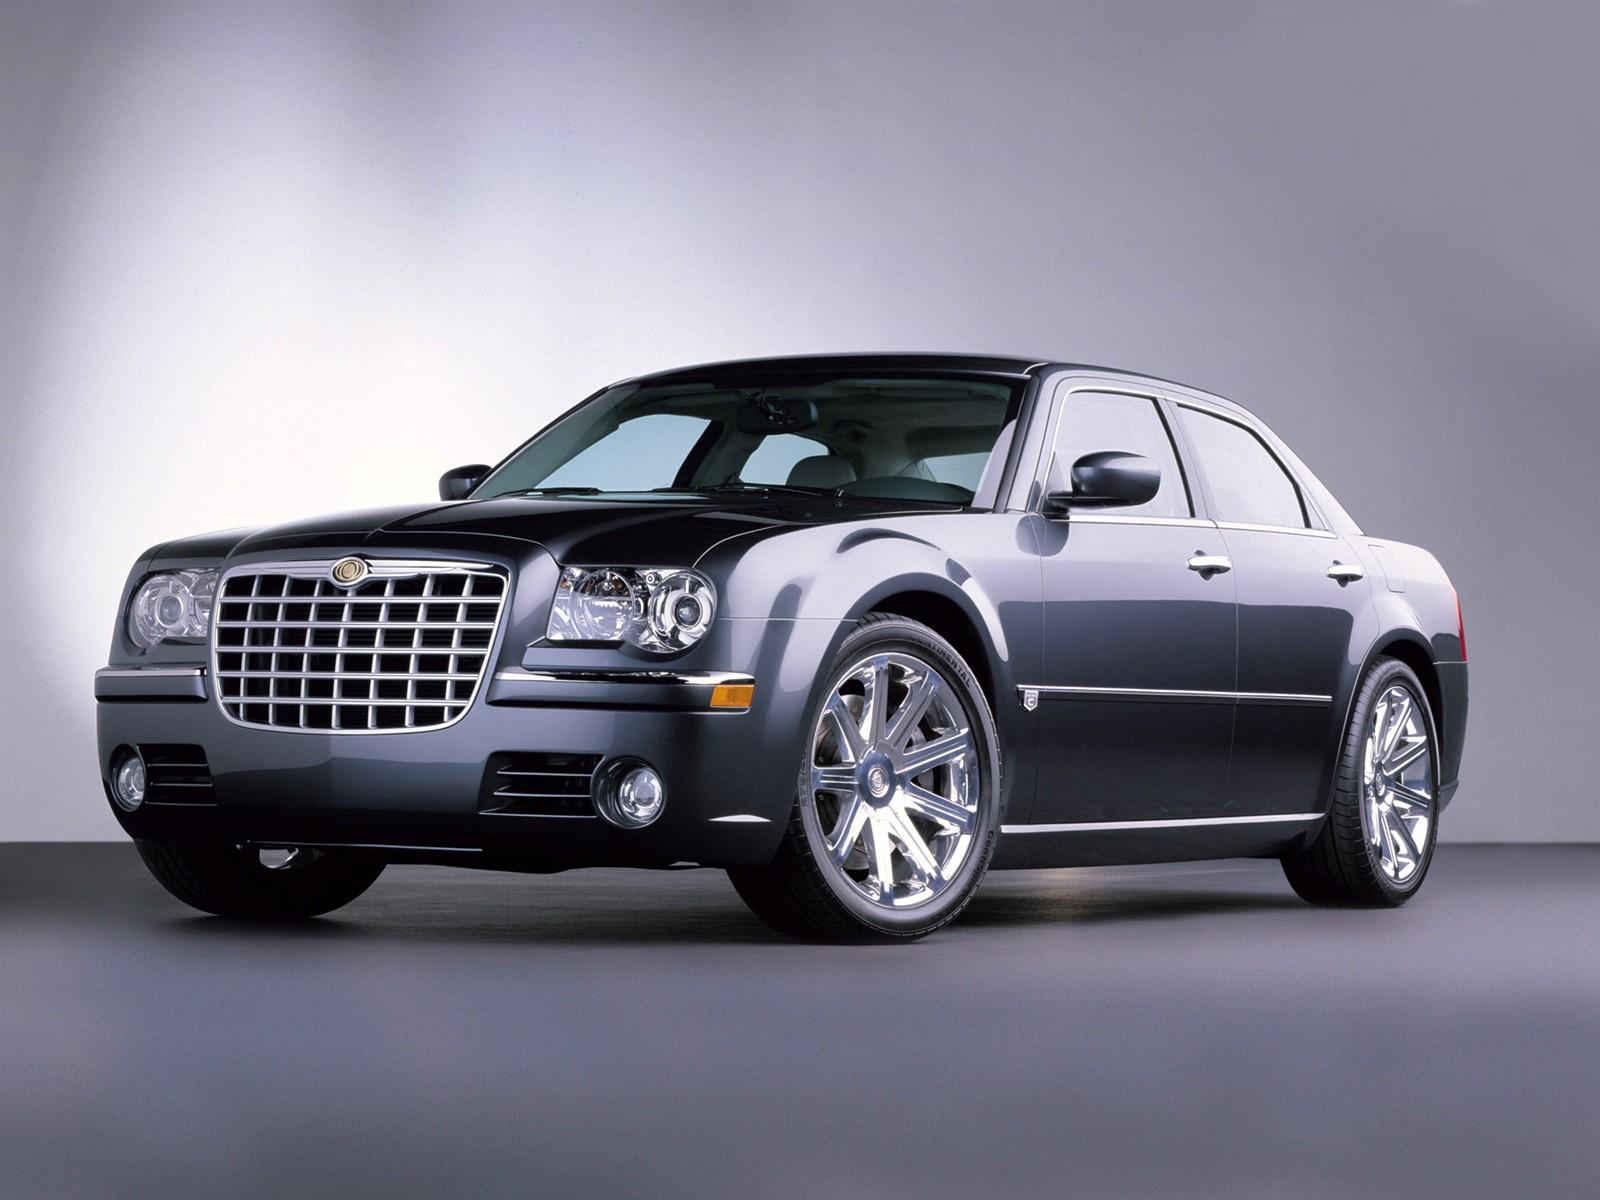 Image Chrysler 300c 003 Jpg Mafia Wars Wiki Fandom Powered By